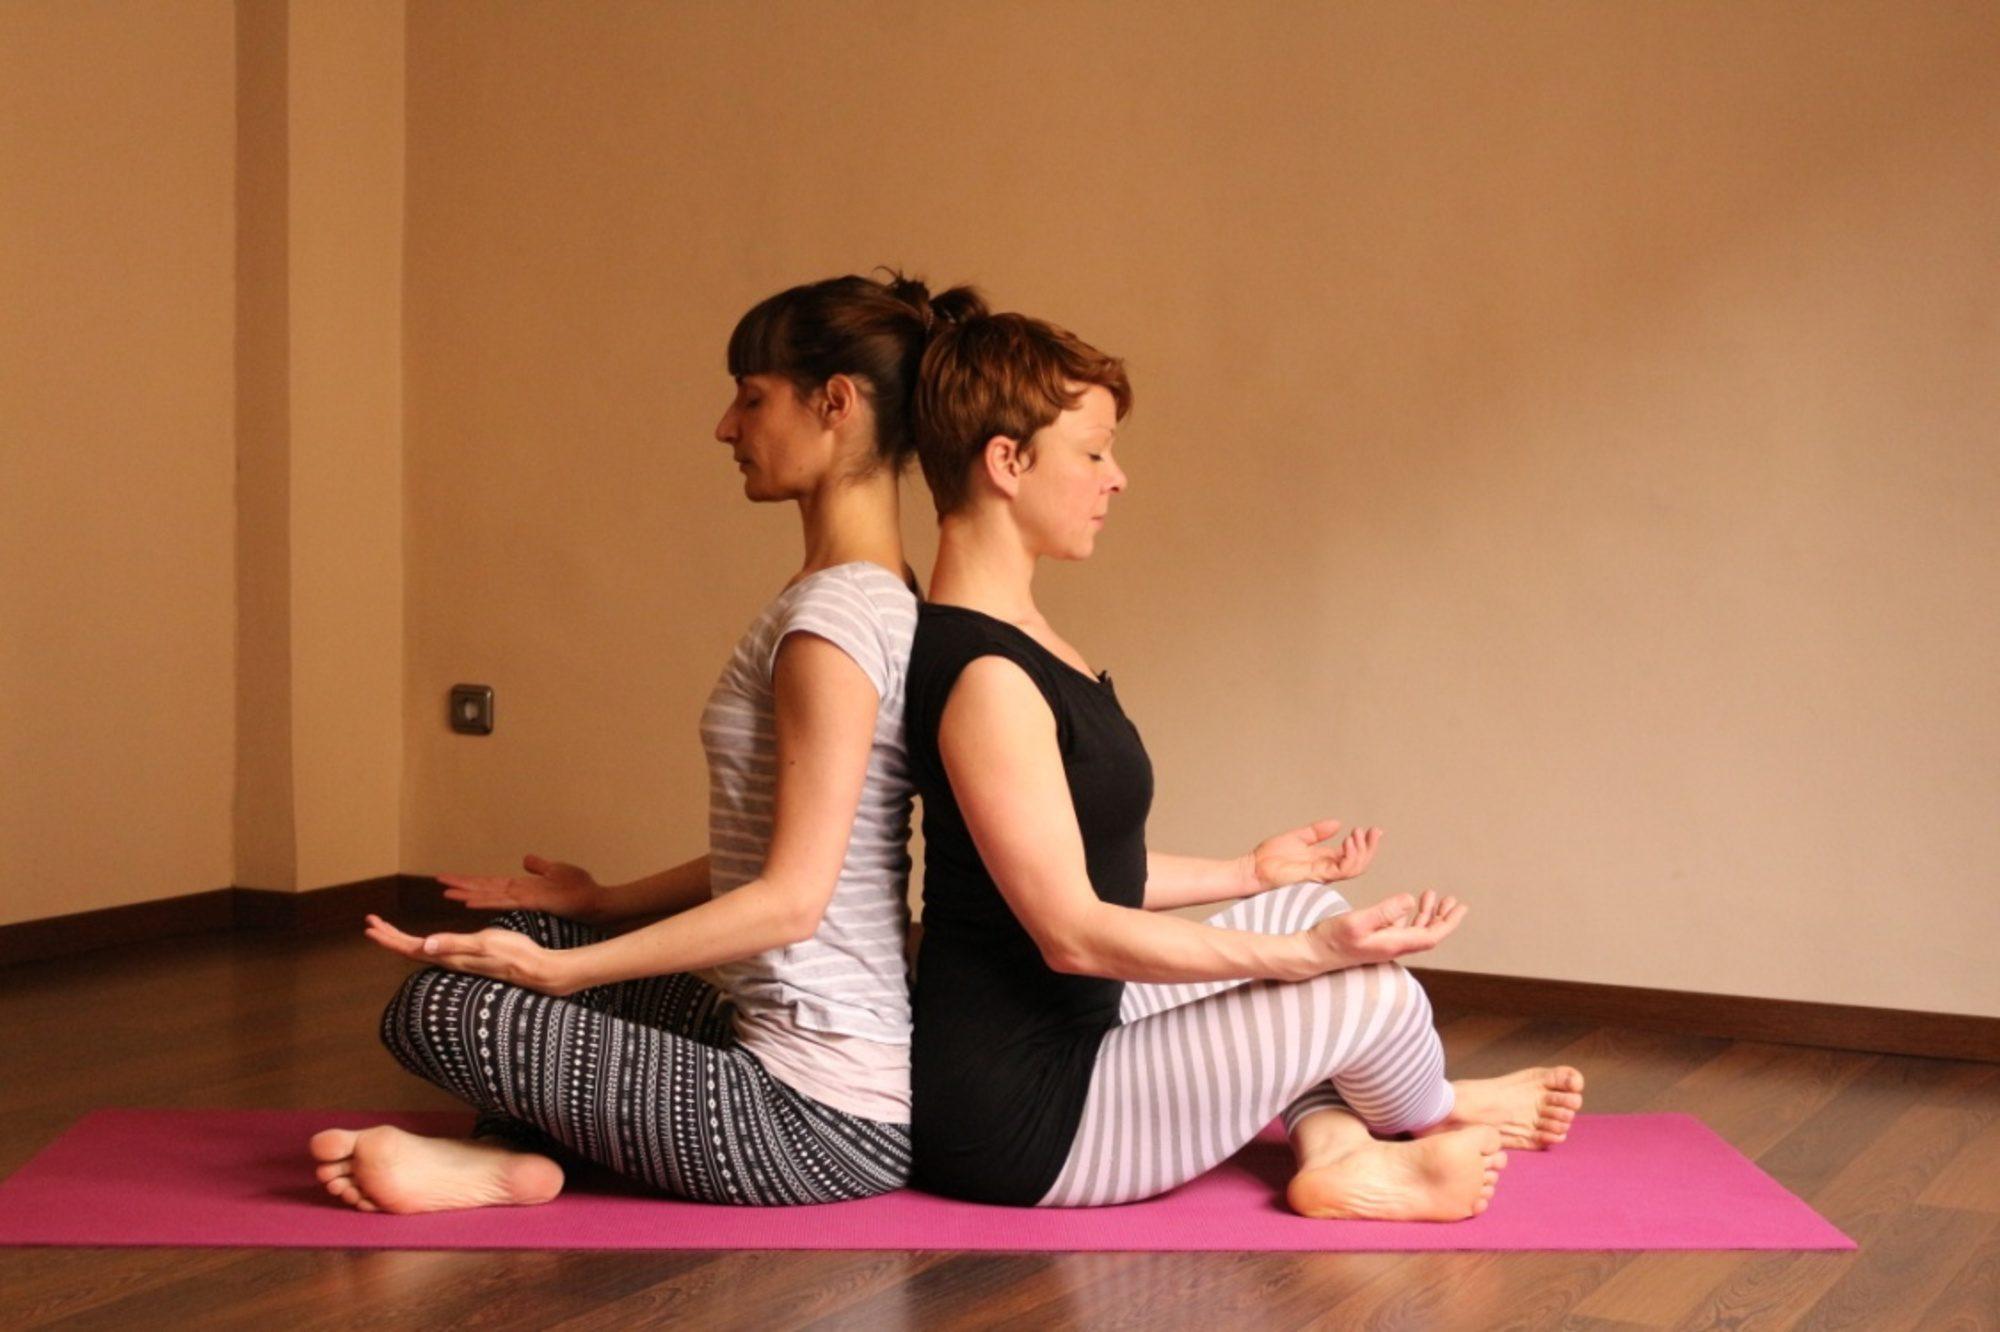 Kontakt-jóga gyakorlatsor 120 percben